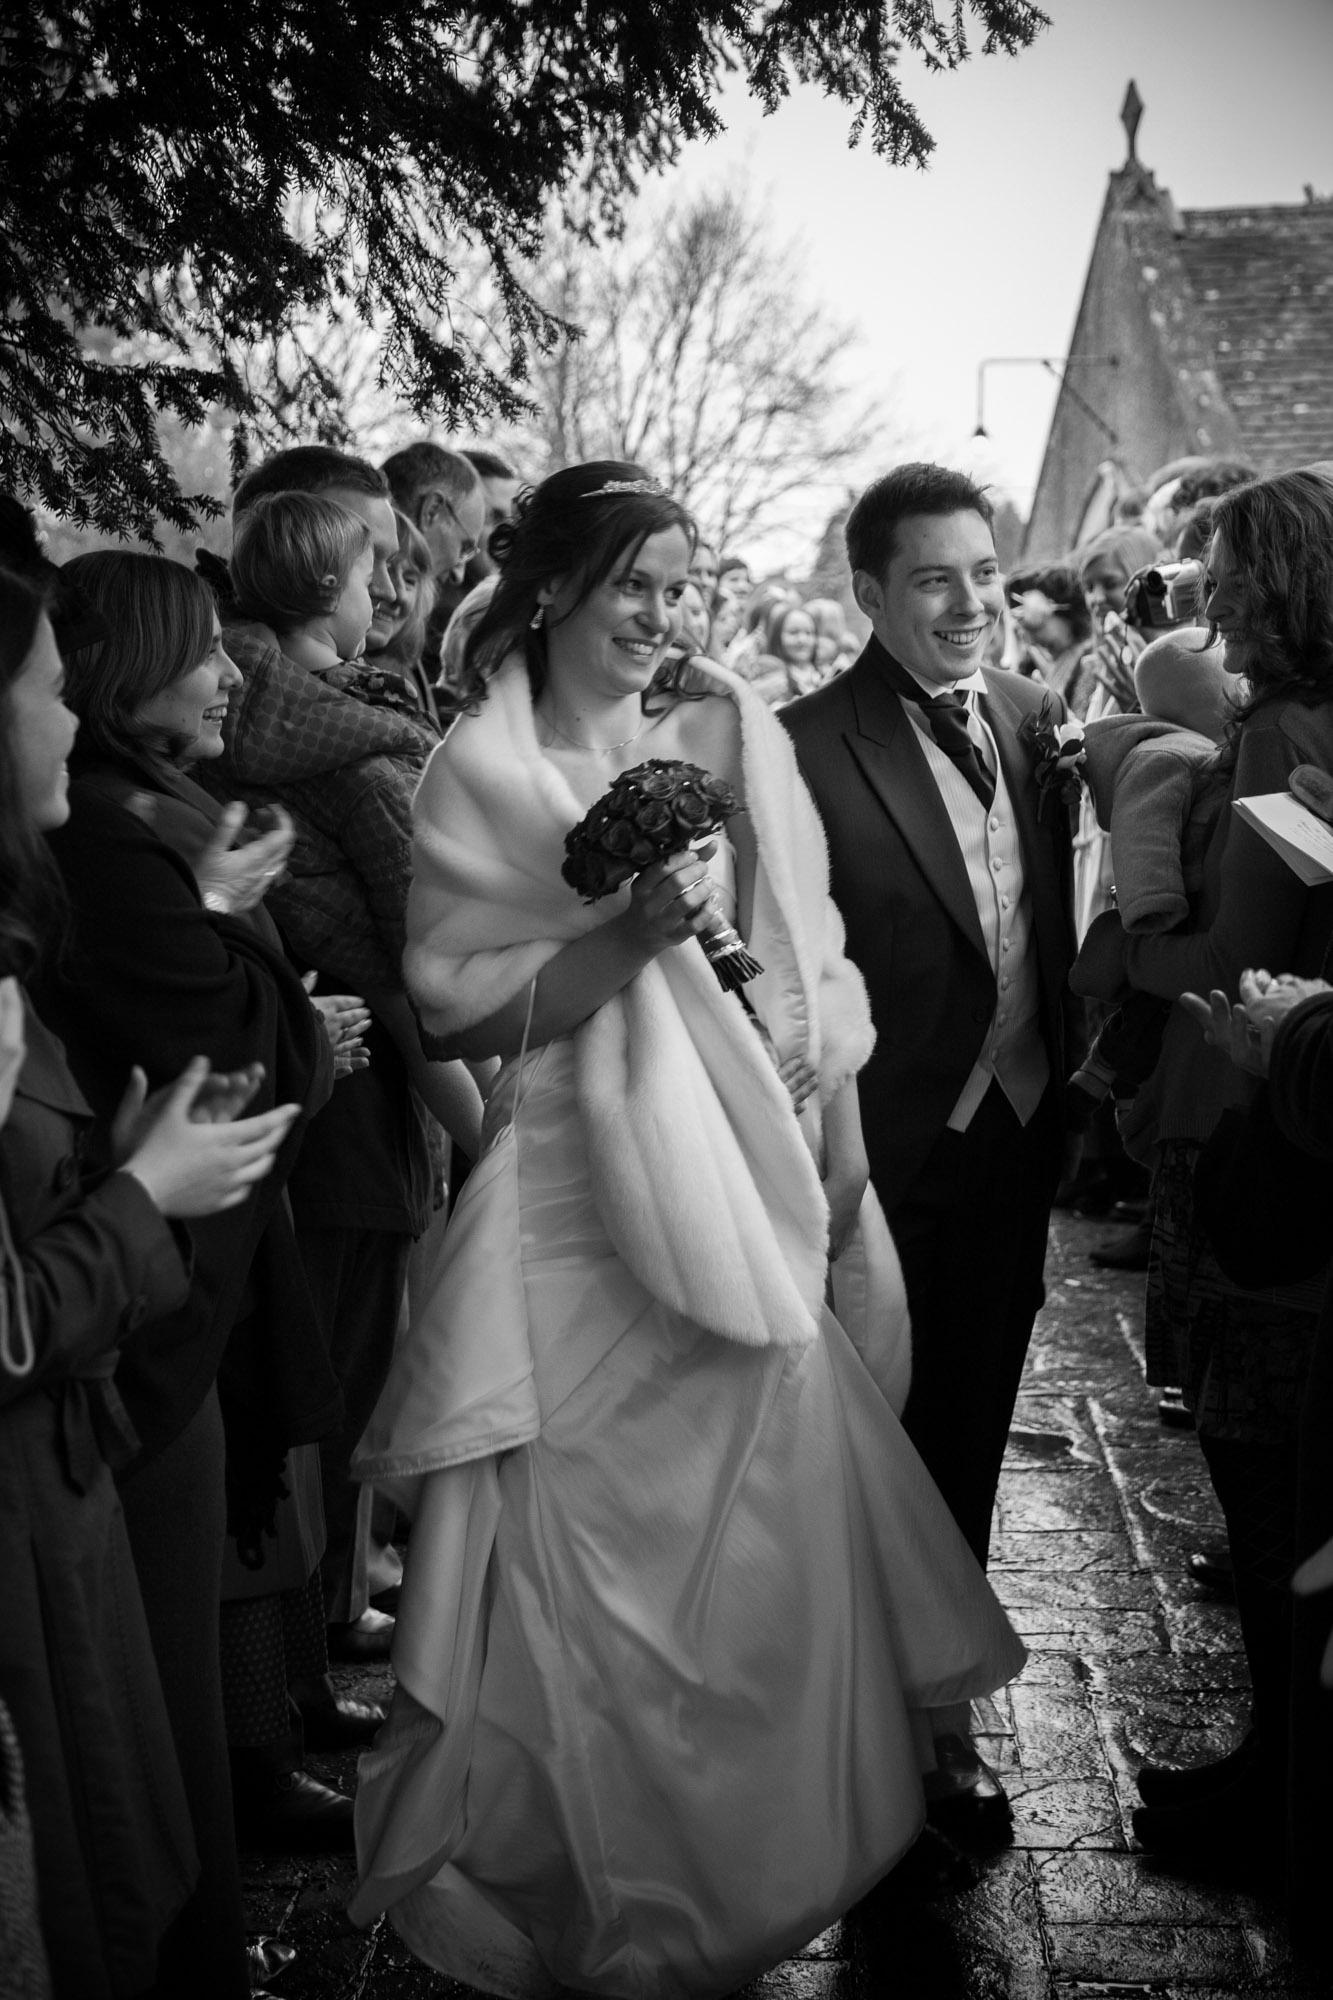 weddings-couples-love-photographer-oxford-london-jonathan-self-photography-51.jpg